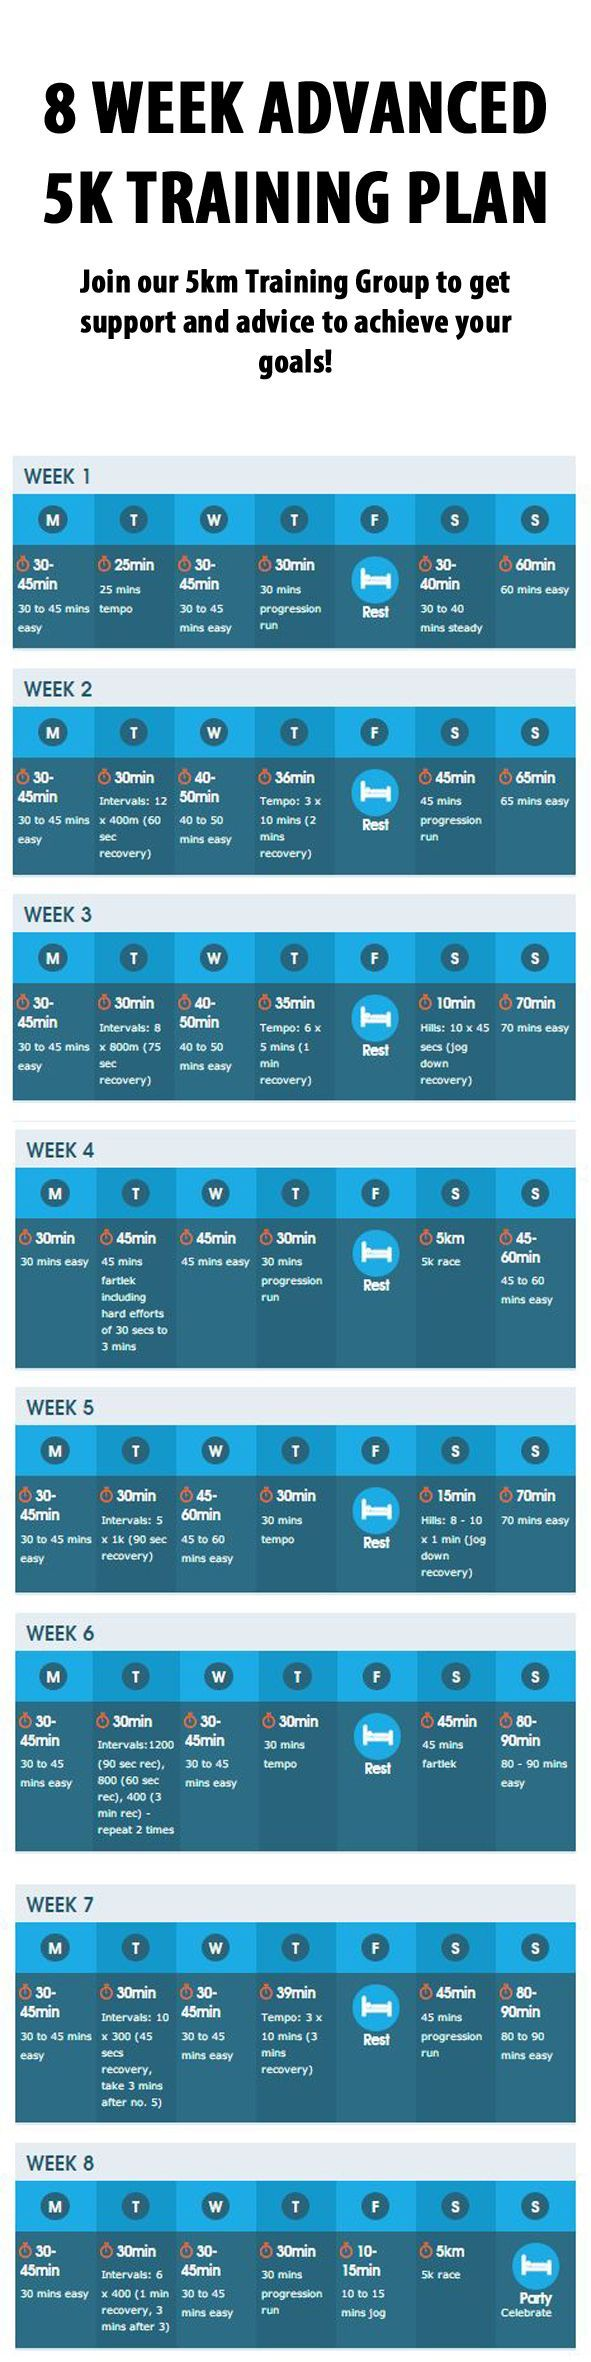 8 WEEK ADVANCED 5K TRAINING PLAN